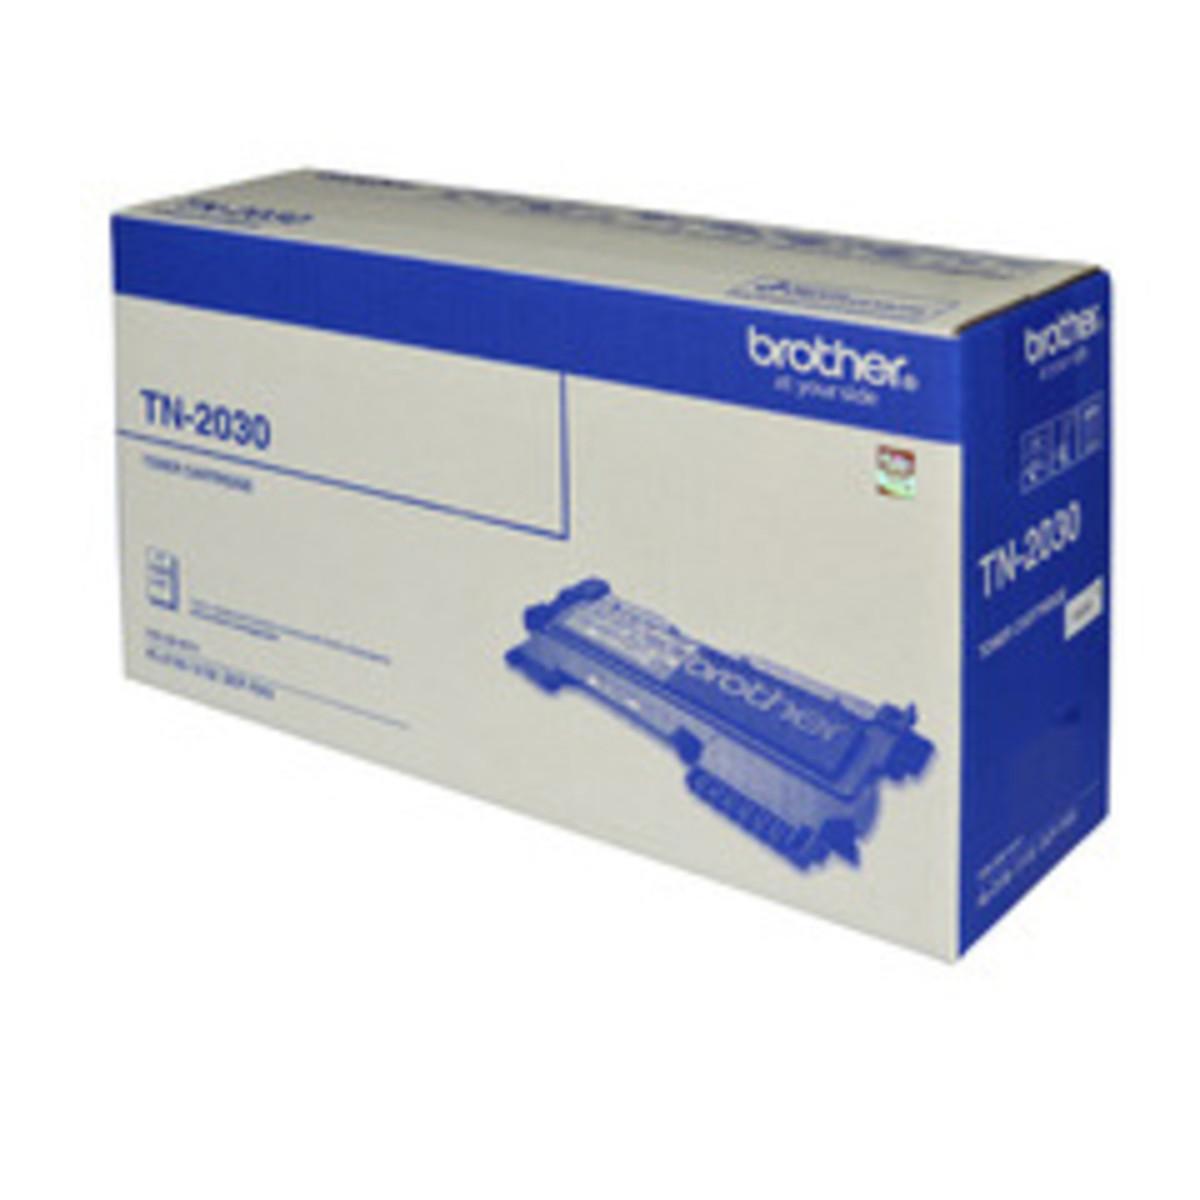 Brother TN-2030 Black Toner Cartridge